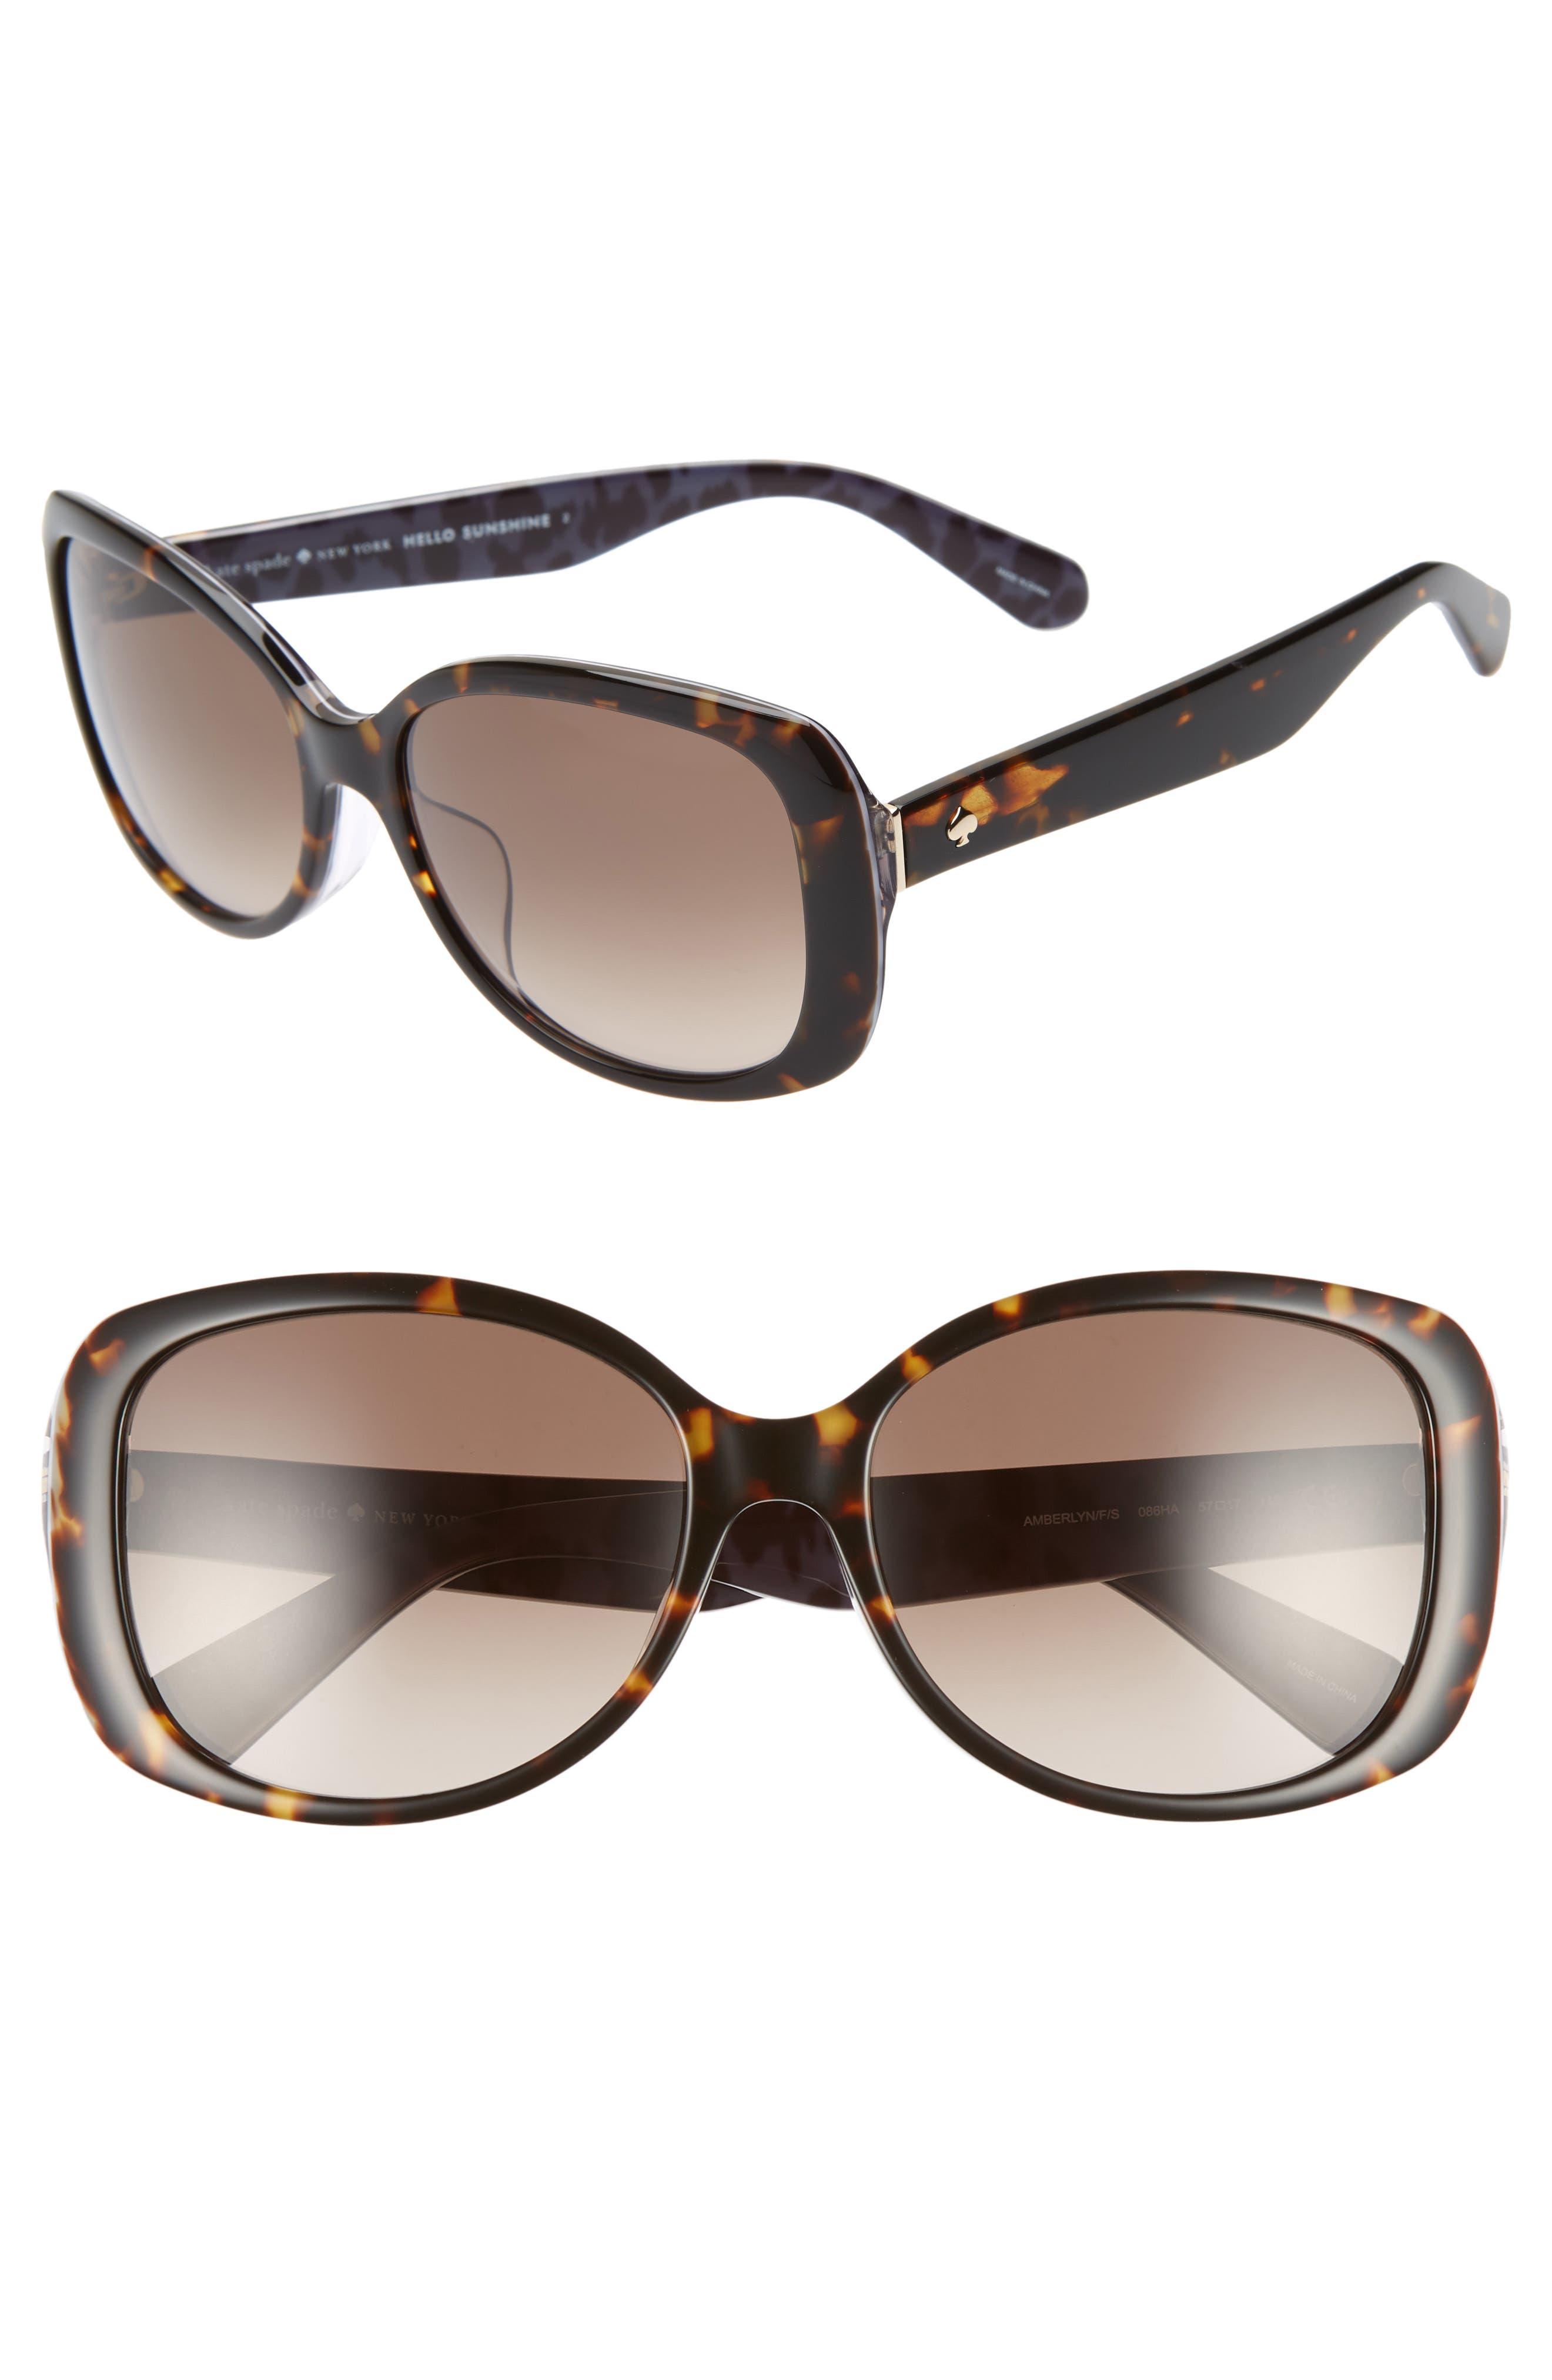 Sunglasses For Women Spade Nordstrom New Kate York HatxTwq